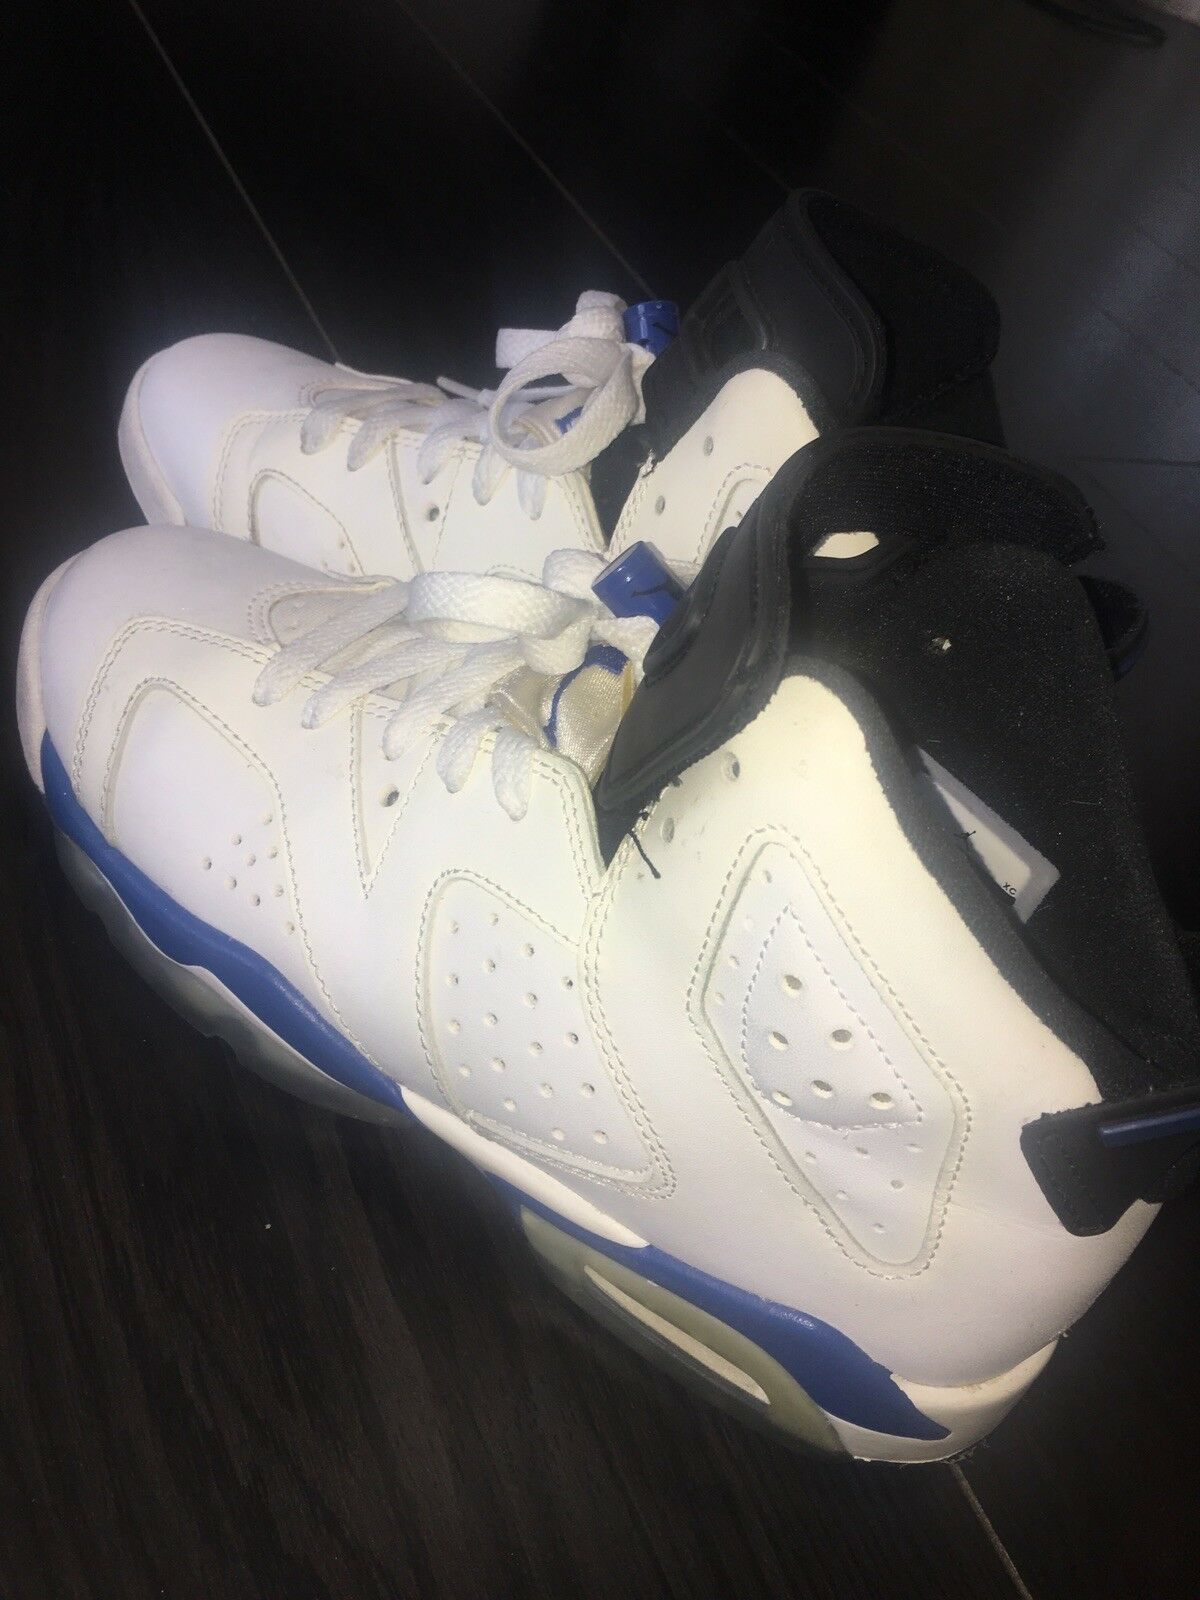 Nike Air Jordan 6 Retro Sport bluee UK size 5